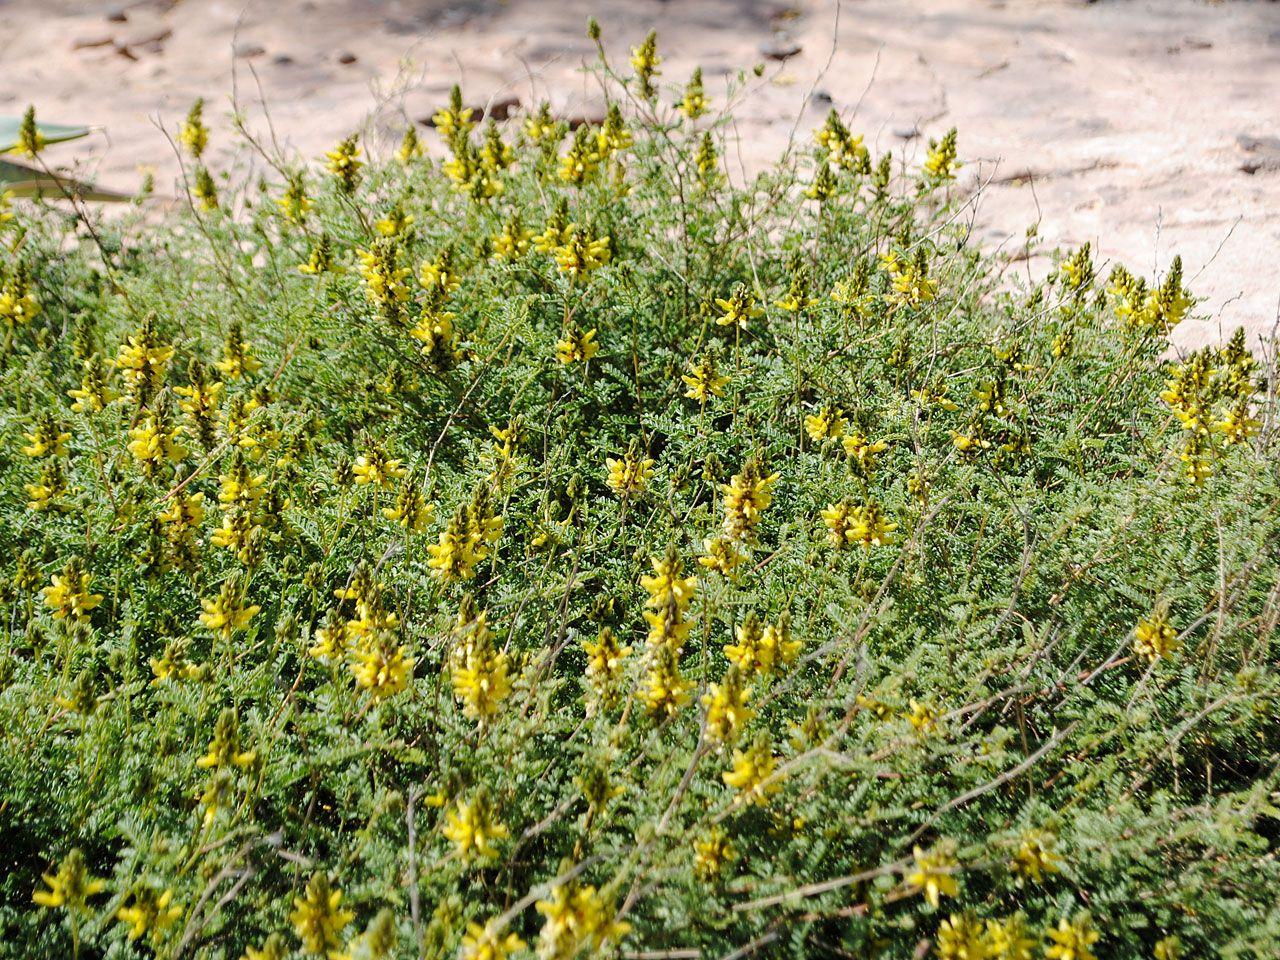 Dalea Capitata Sierra Gold Sonoran Desert Low Growing